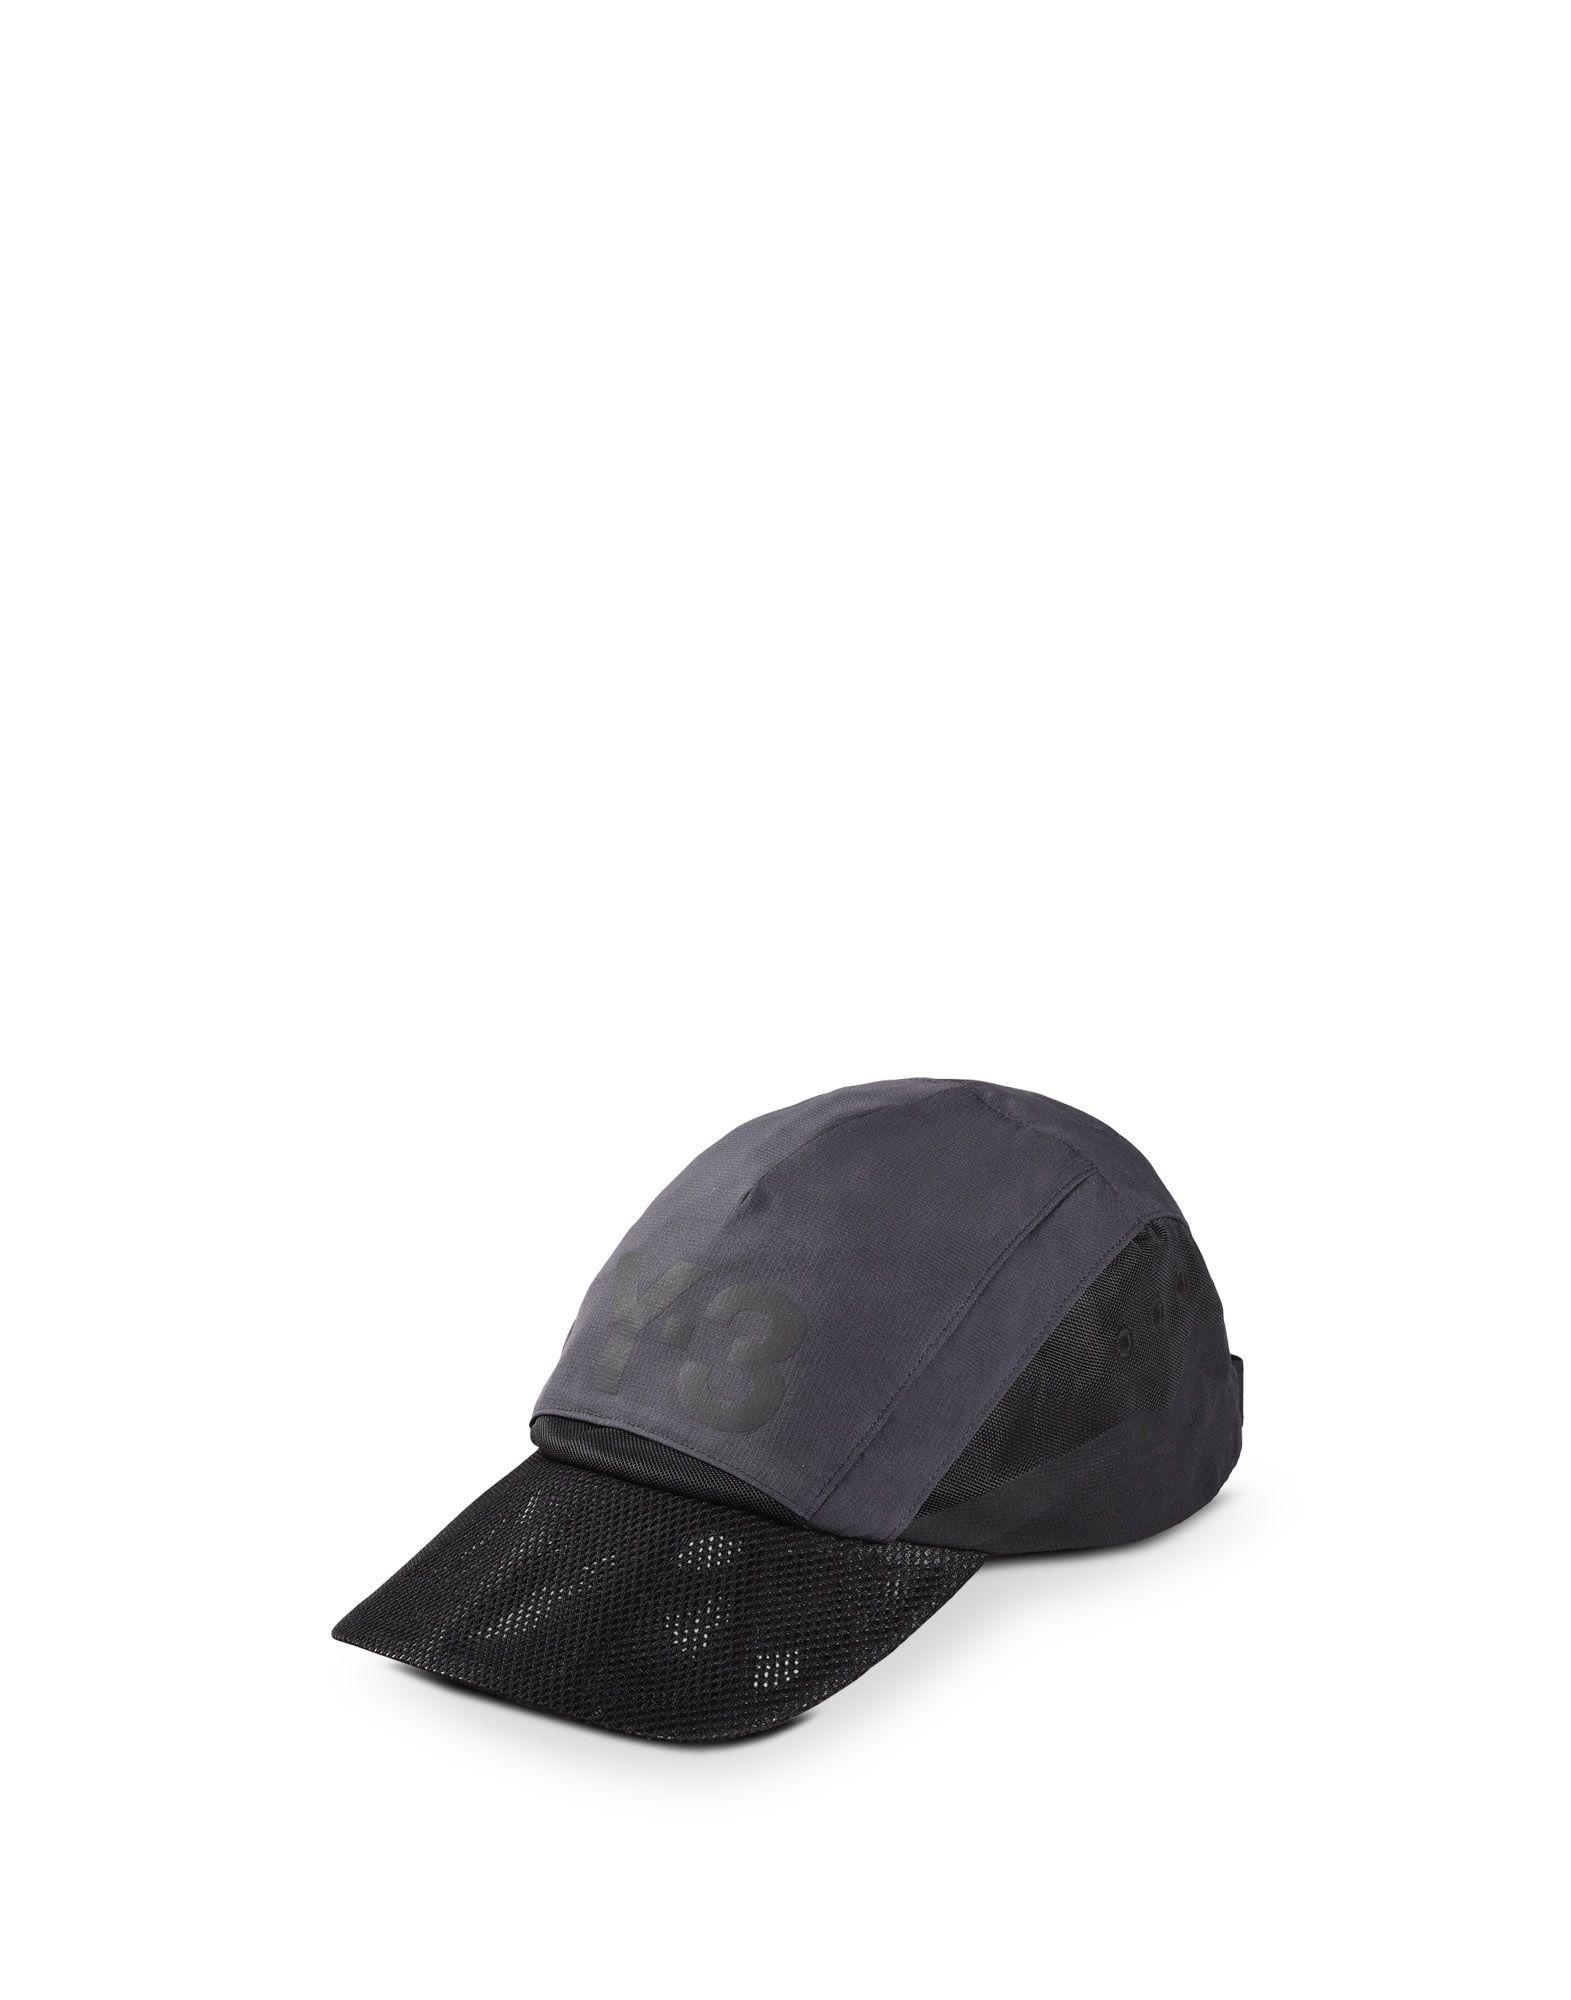 3892e7b15c2c Y-3 RUN BLACK CAP OTHER ACCESSORIES unisex Y-3 adidas